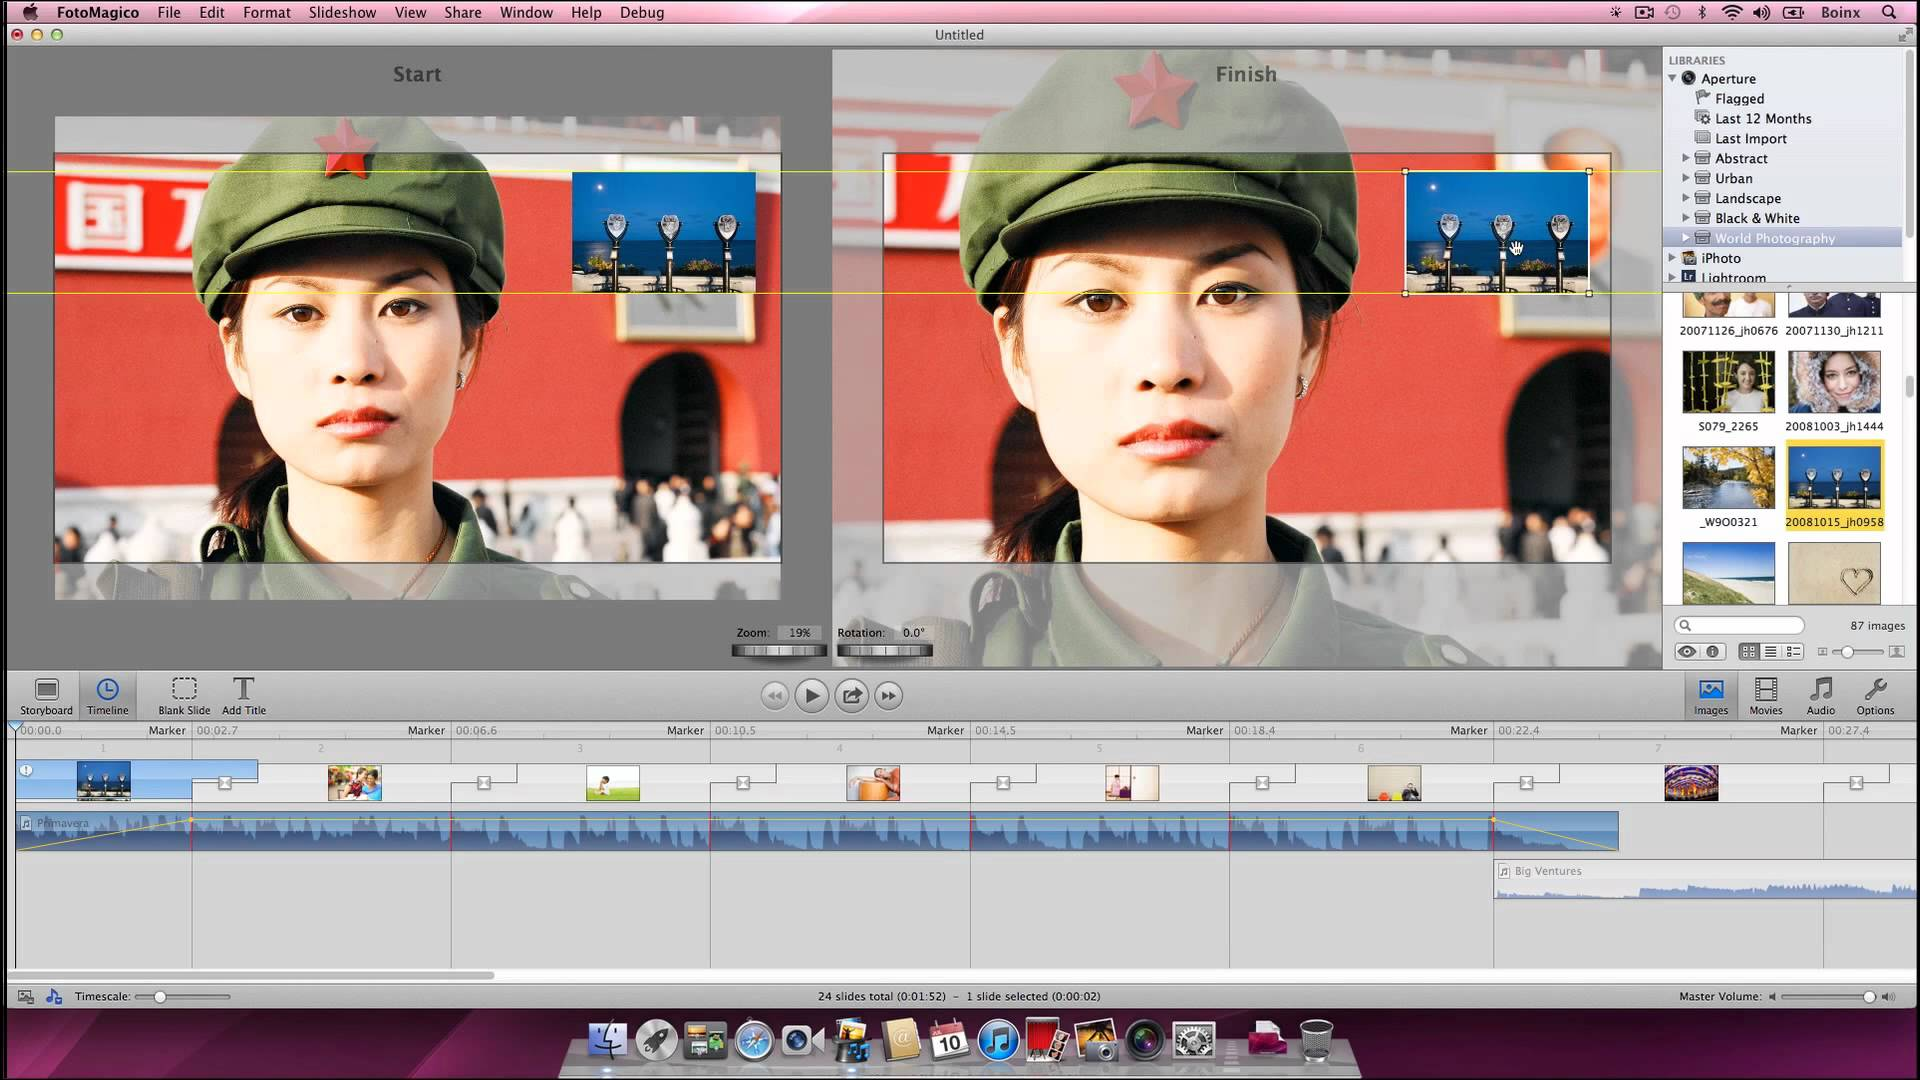 Boinx FotoMagico Pro mac